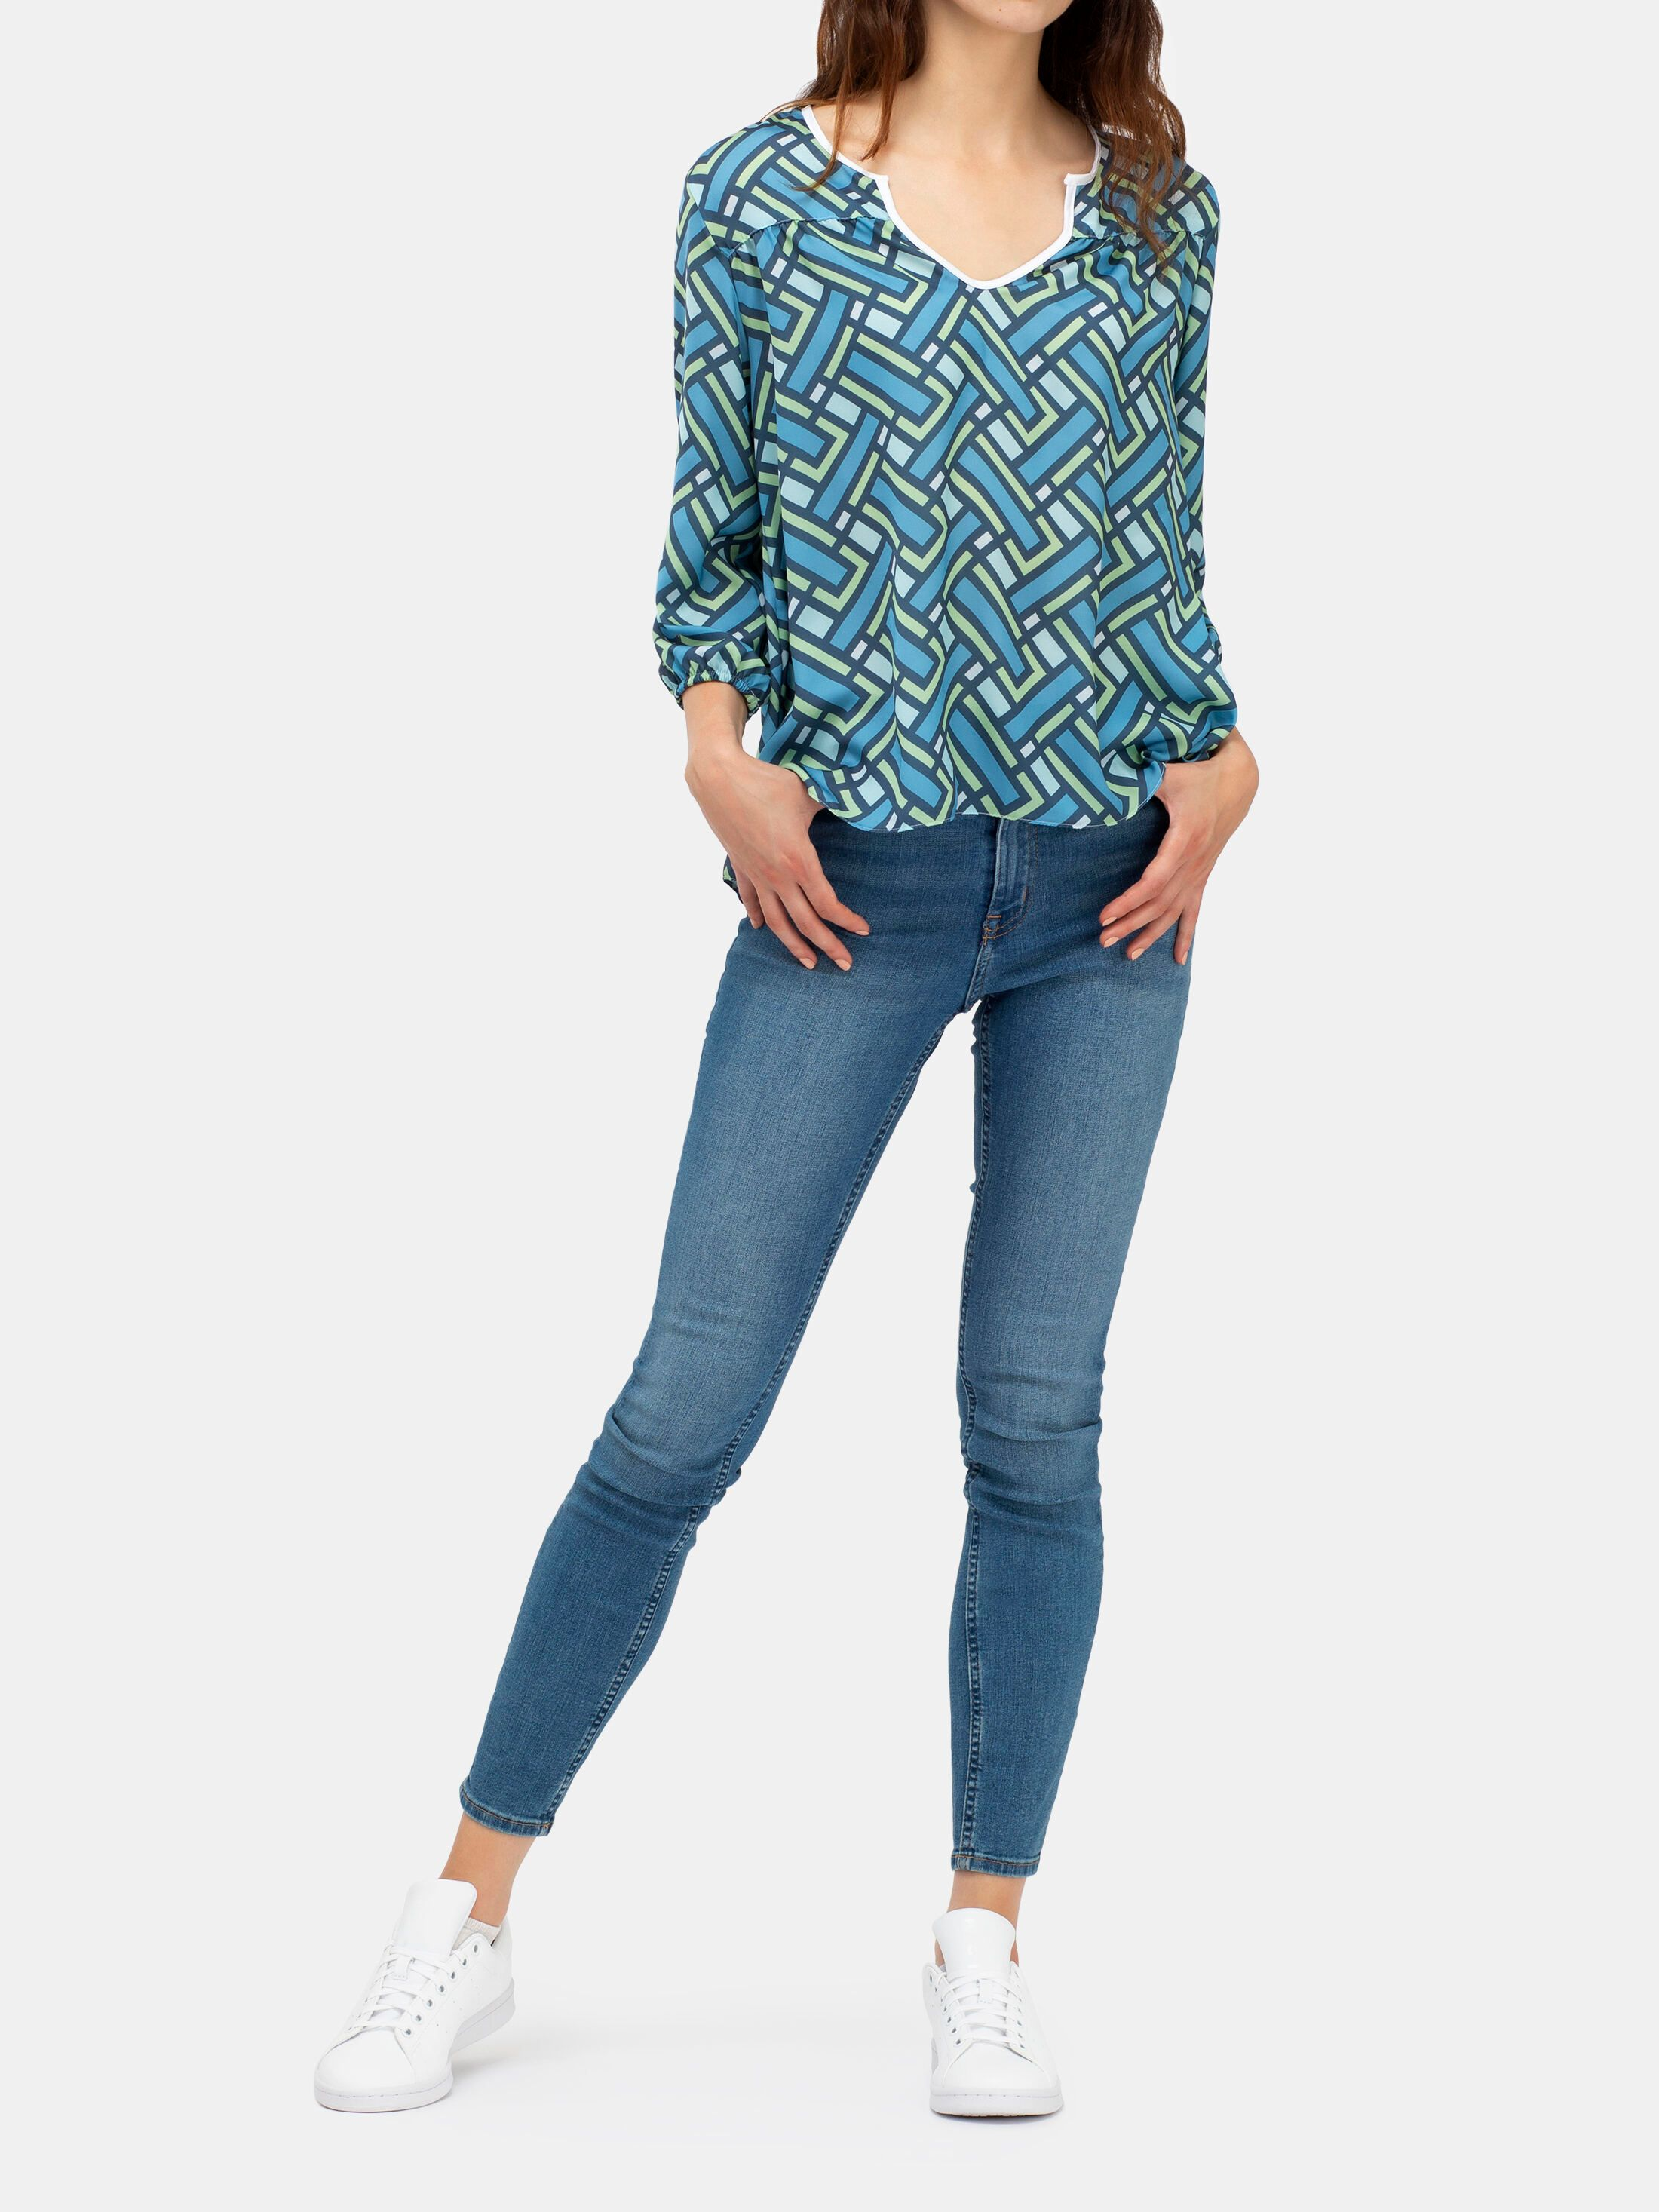 printed blouse sleeve details